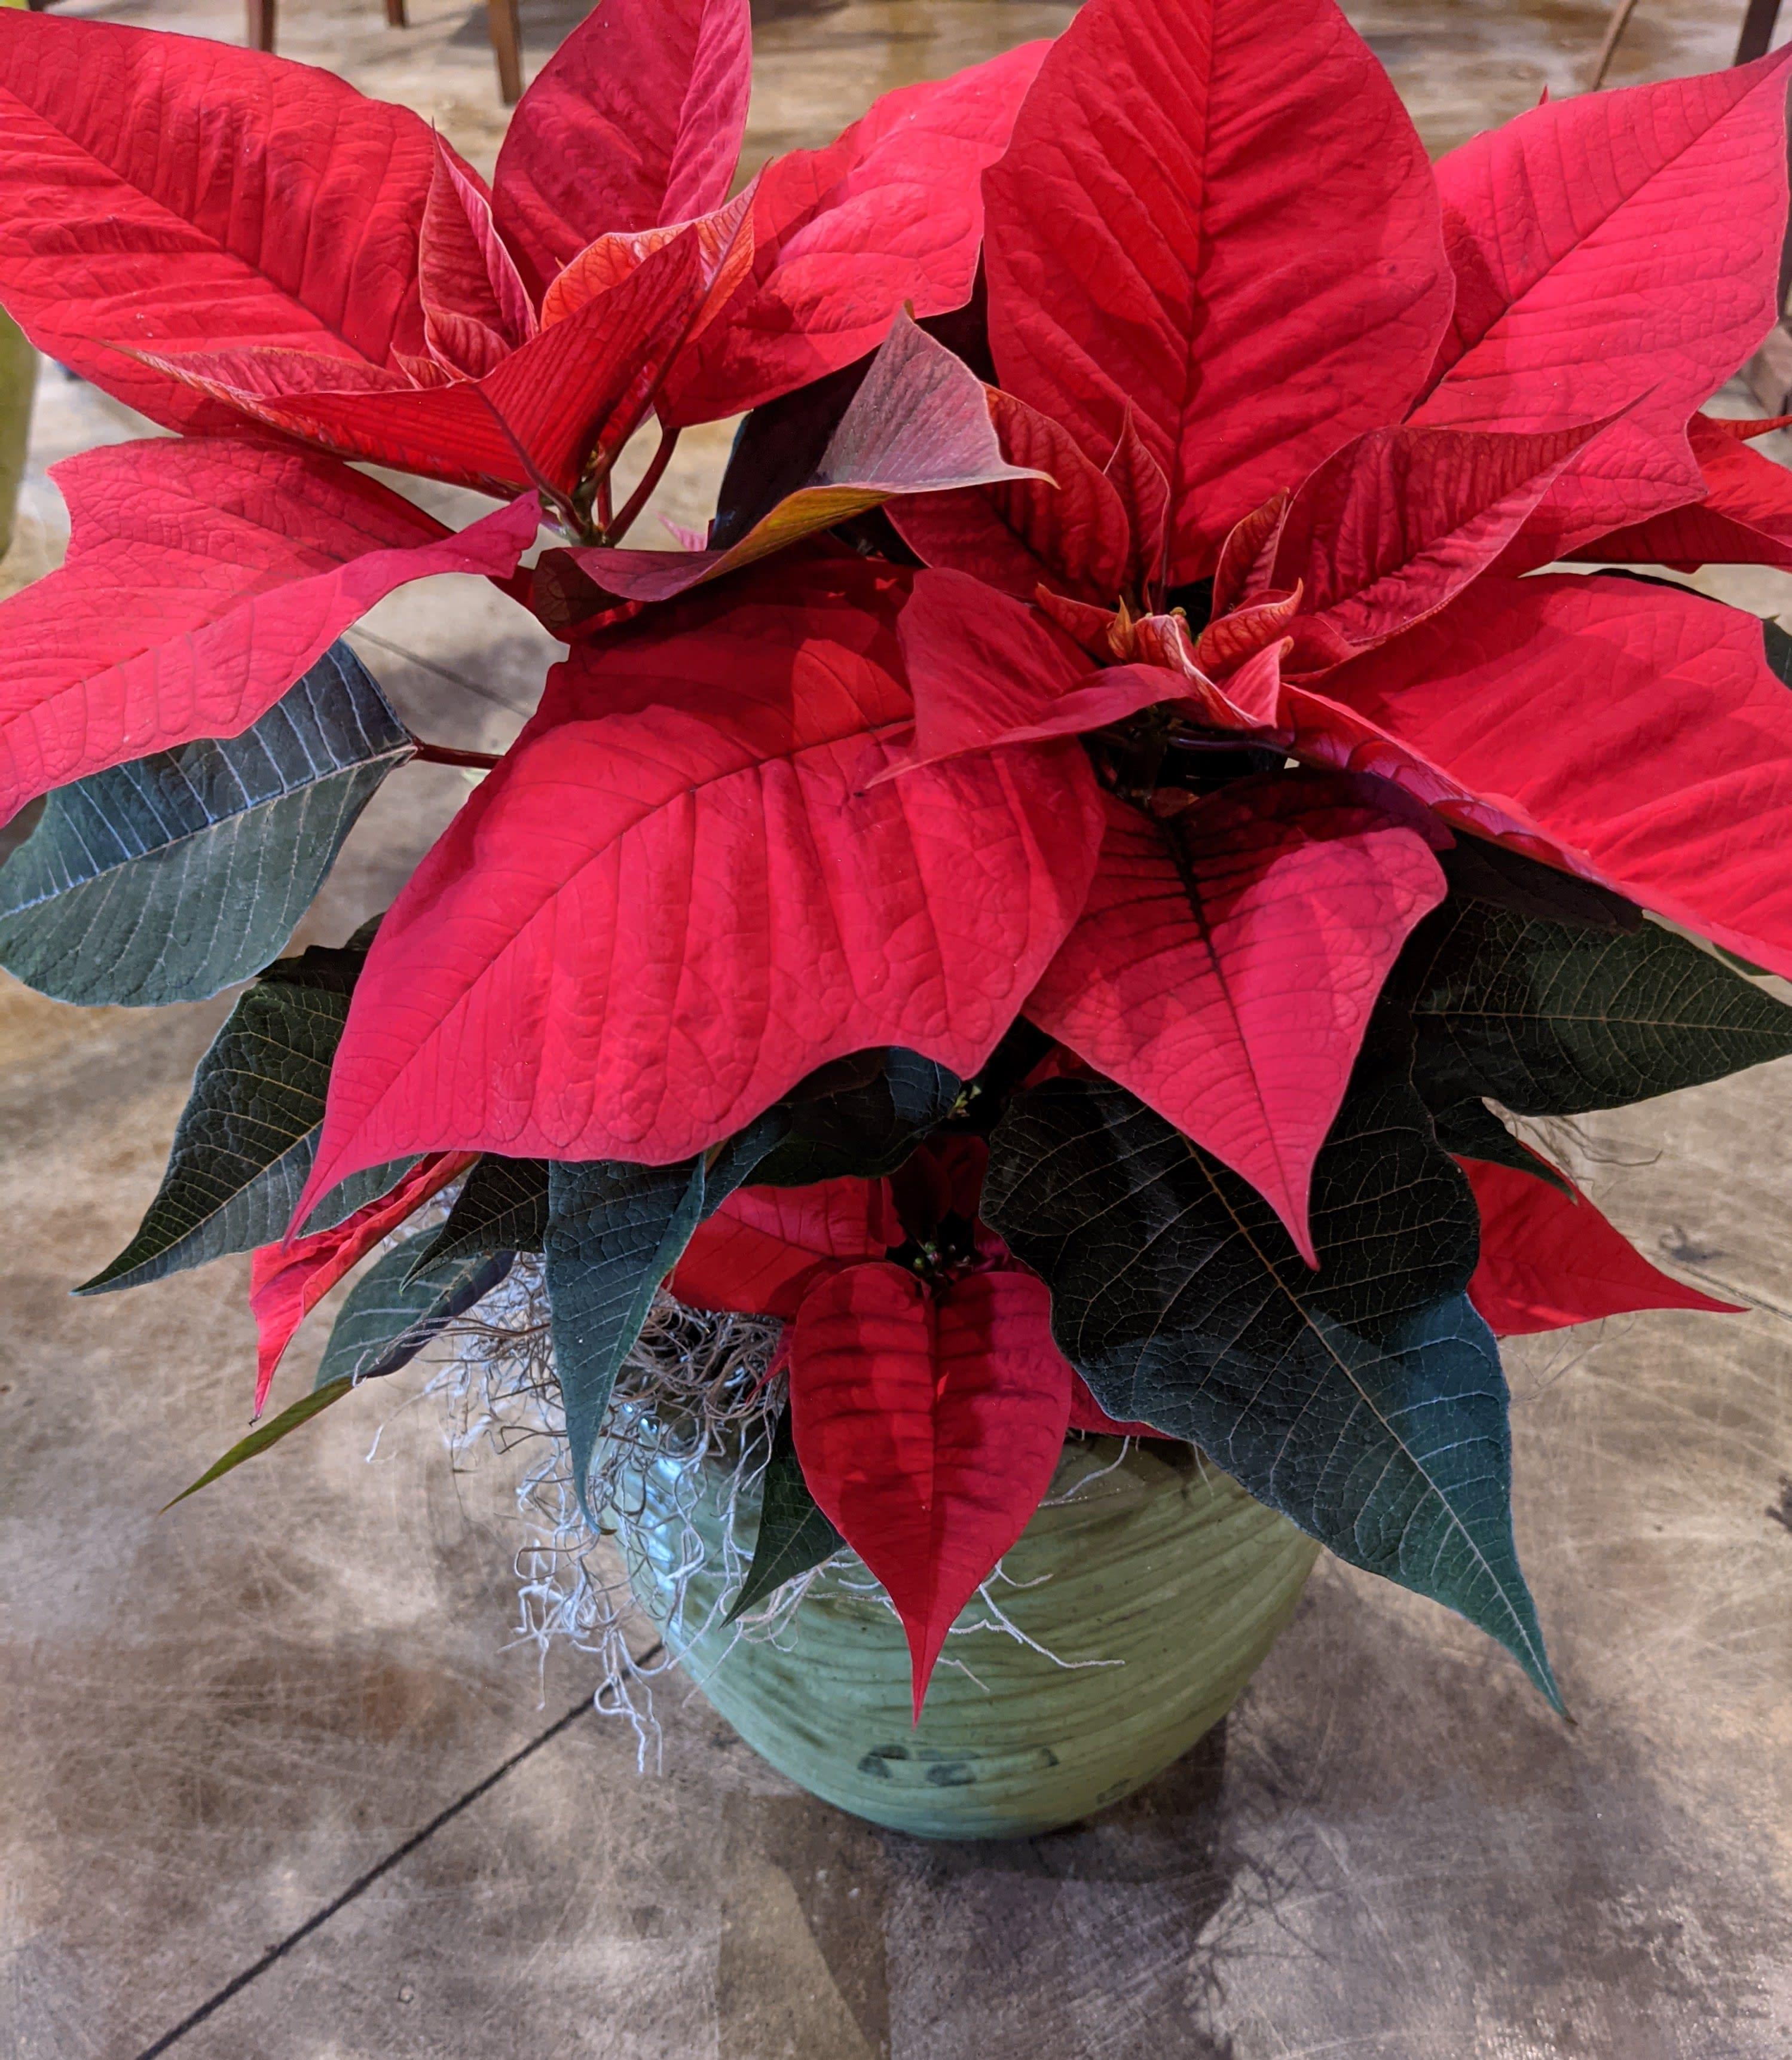 Classic Red Poinsettia In Atlanta Ga 2000ad Inc